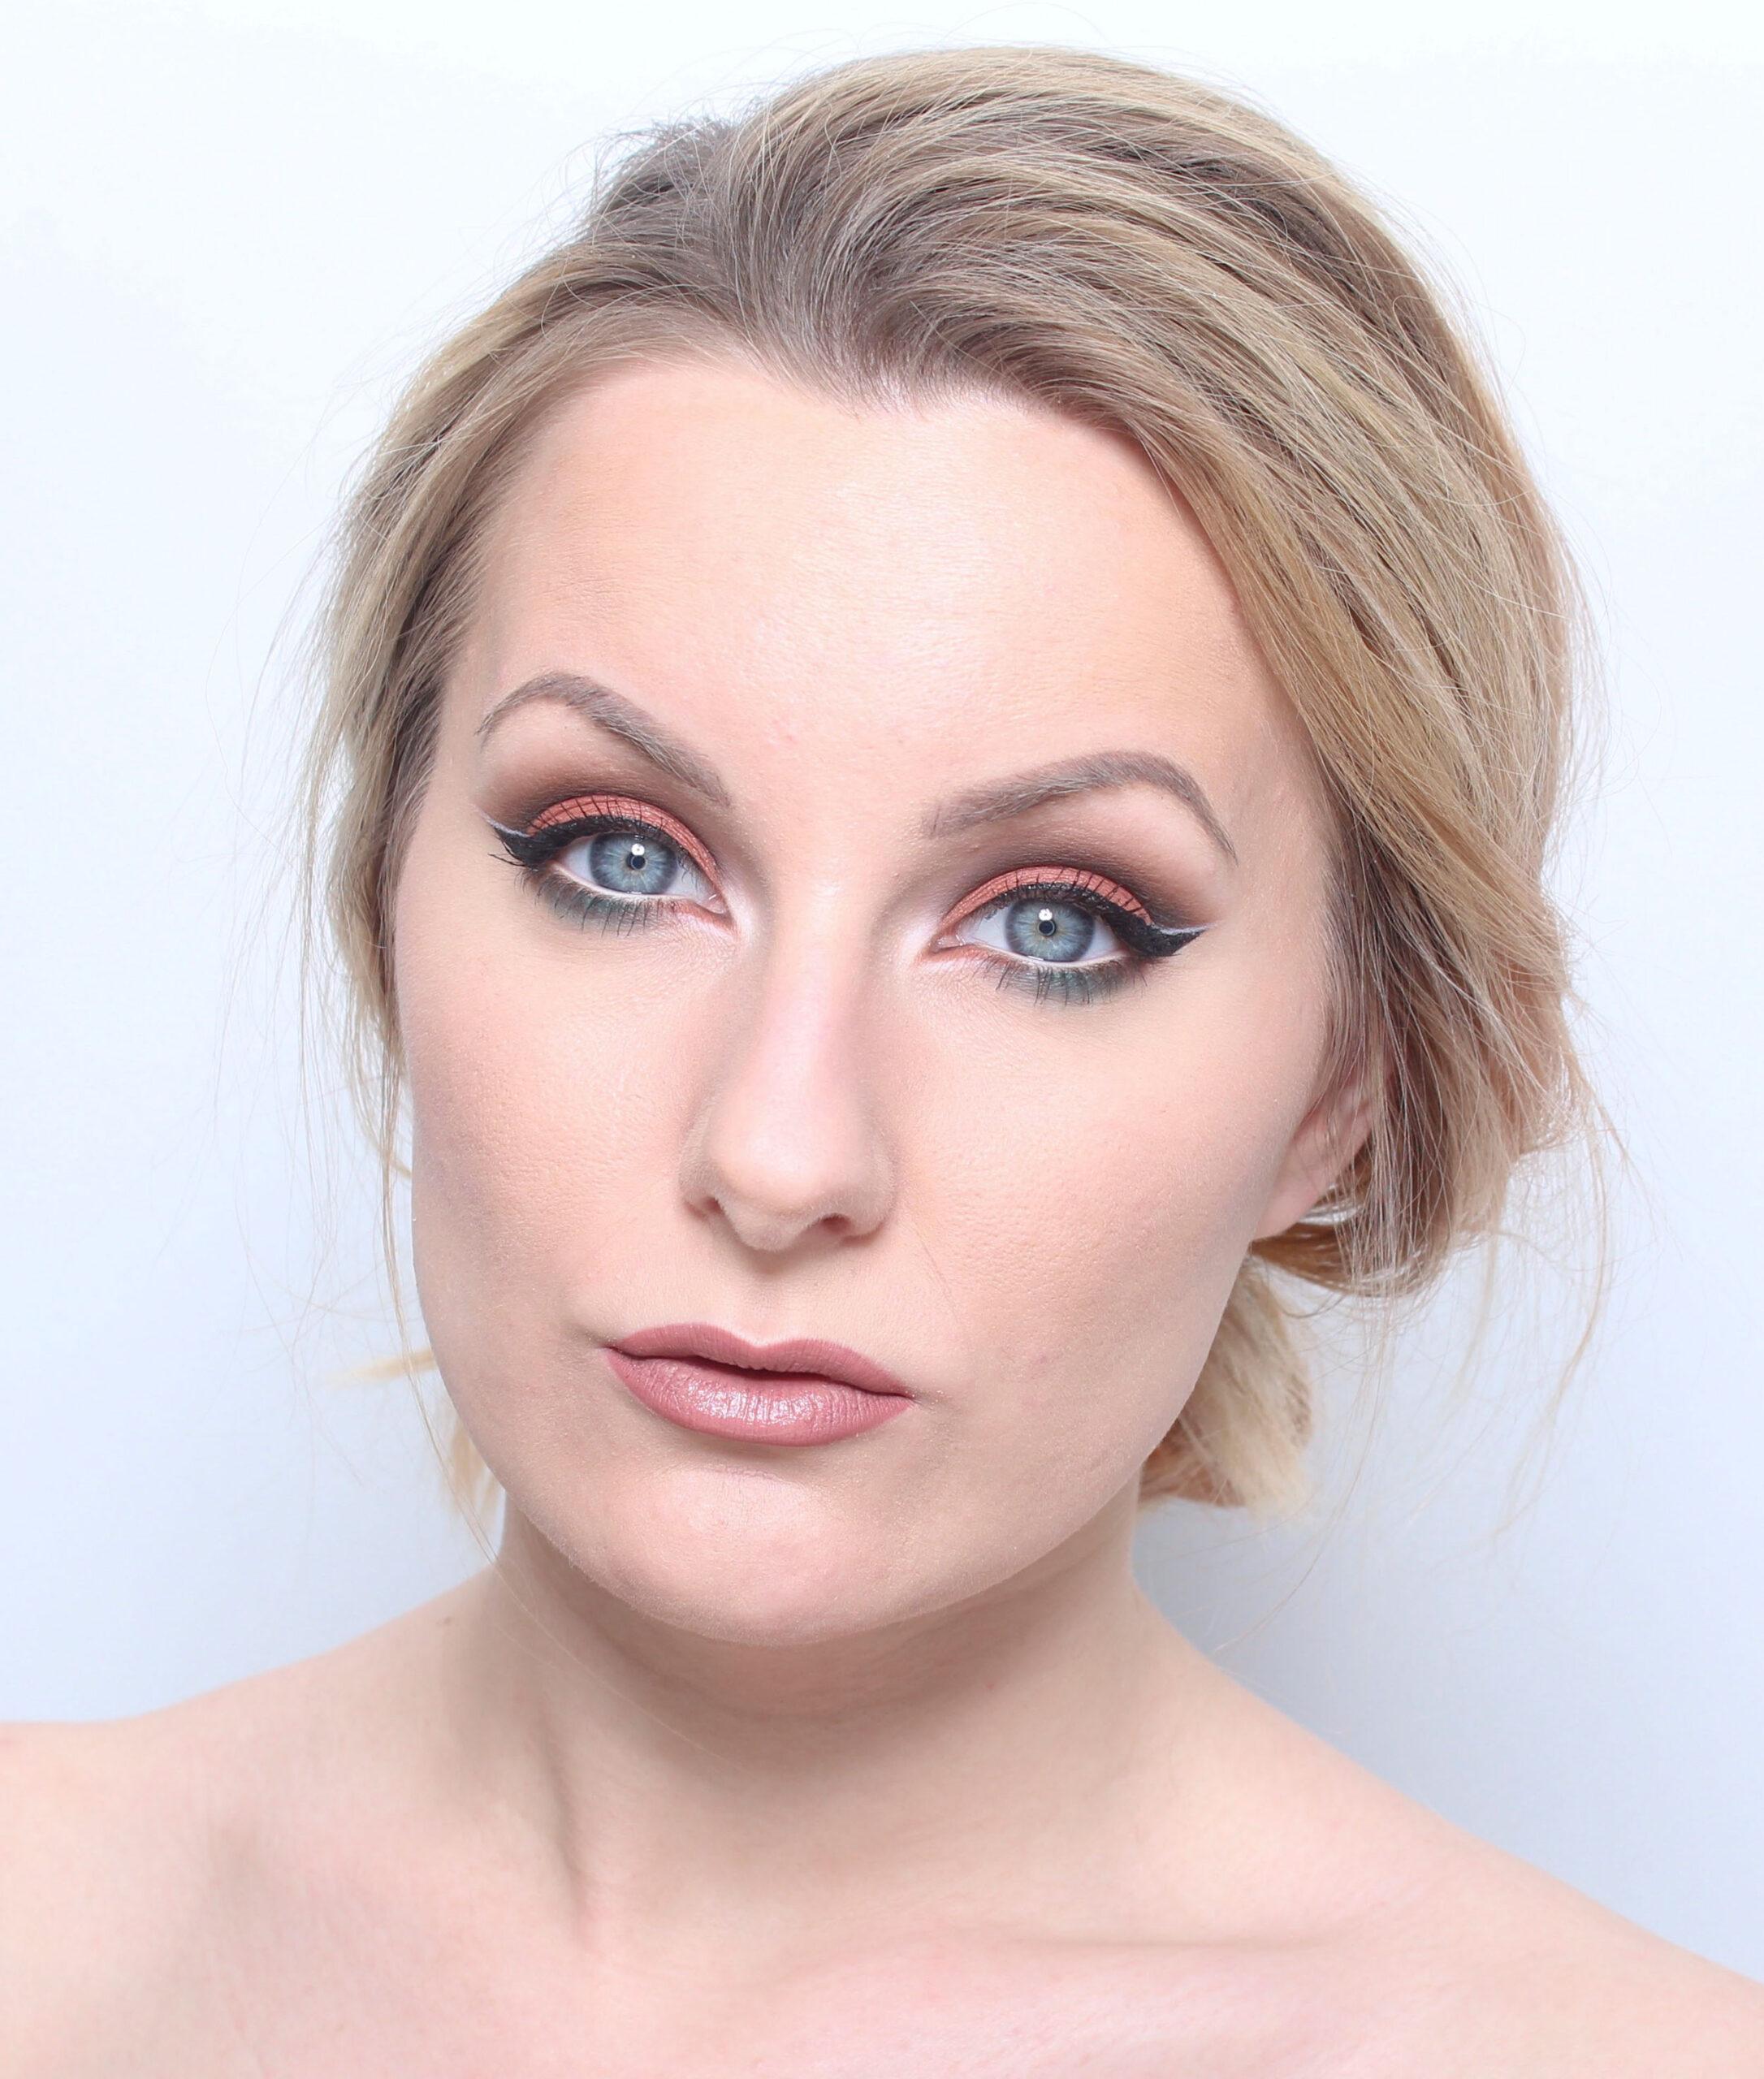 Nyx Explicit Makeup Tutorial Imakeyousmile Se